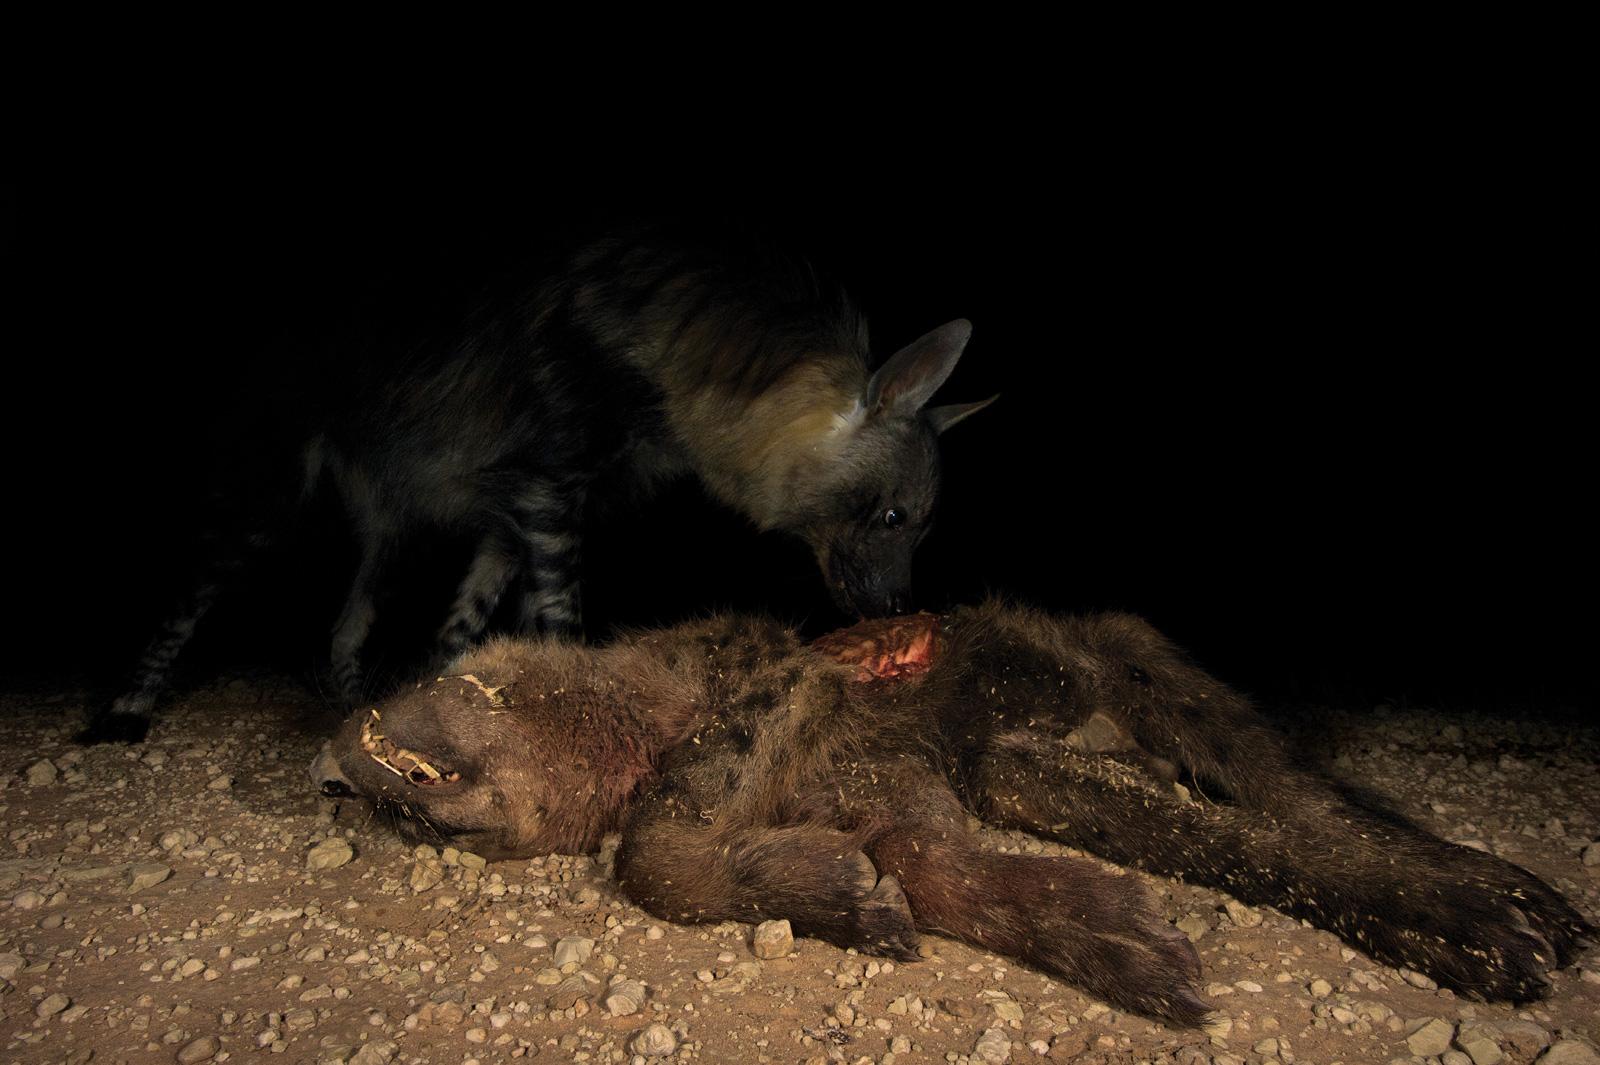 Hannes-Lochner-Kalahari-brown-hyena-eats-spotted-hyena